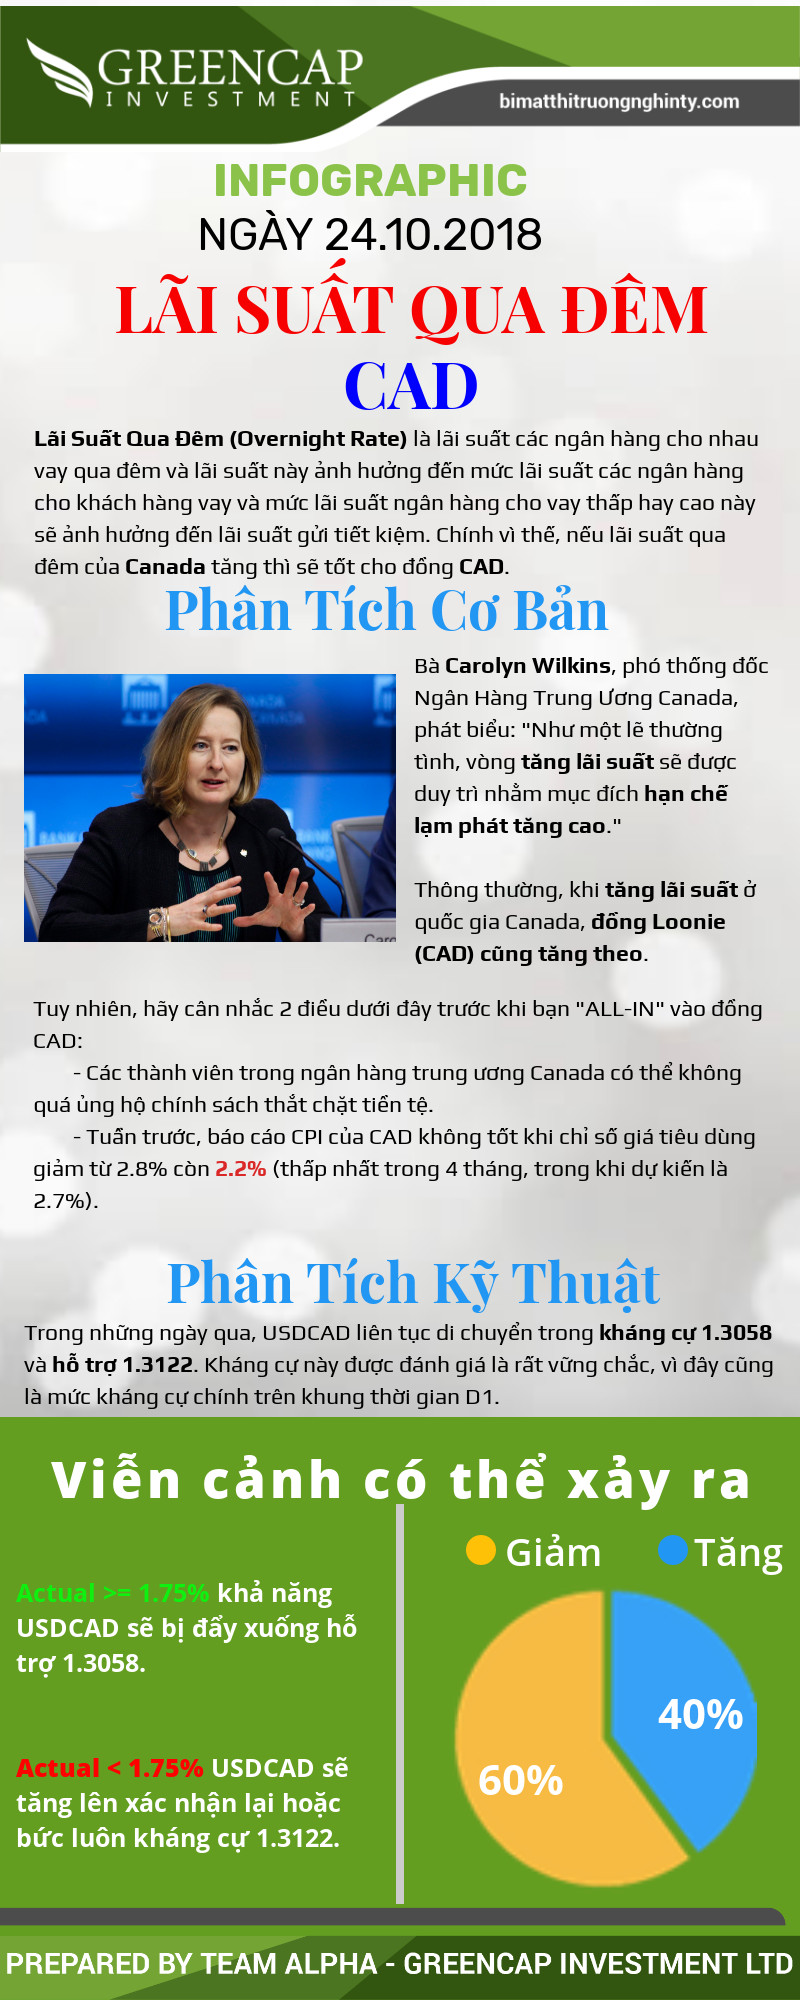 Infographic Lãi Suất Qua Đêm CAD Ngày 24.10.2018